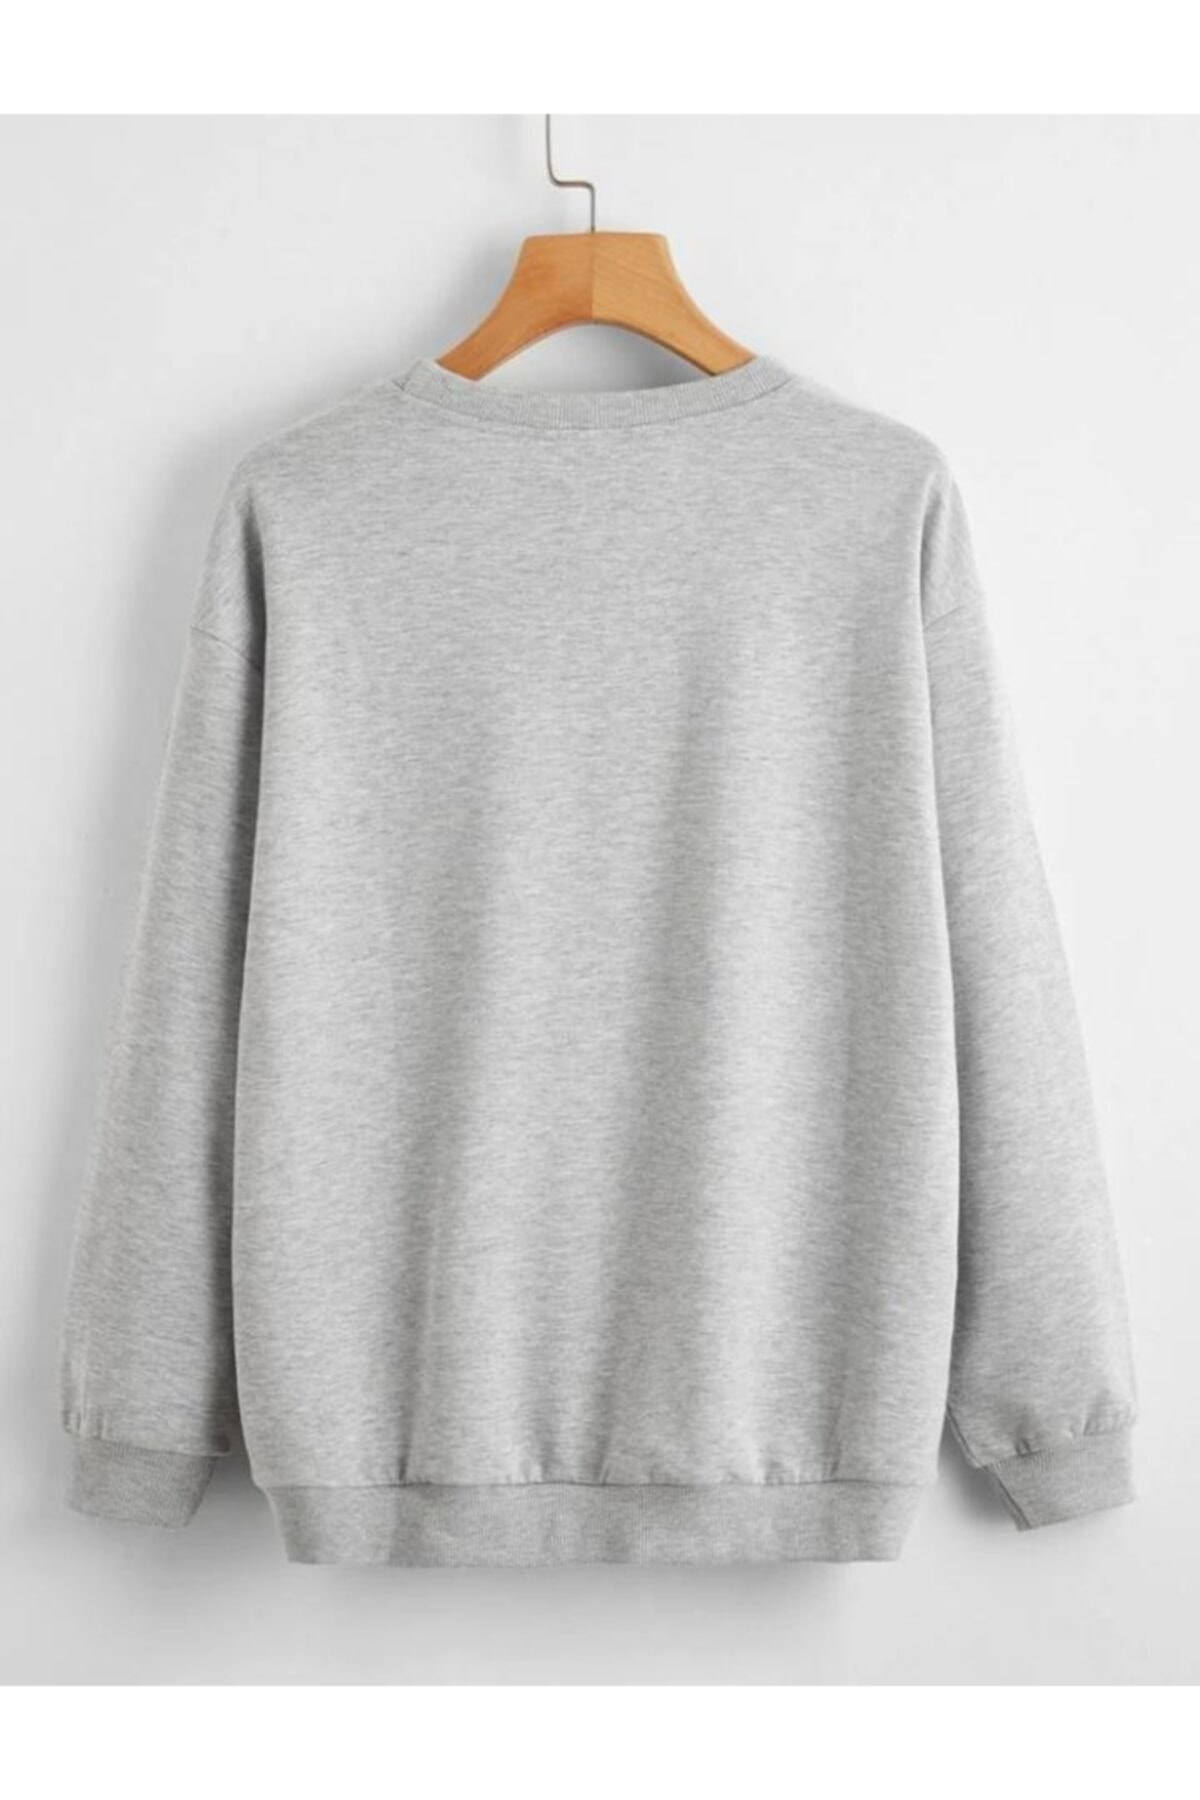 cartoonsshop Unisex Gri Düz Basic Sweatshirt 2